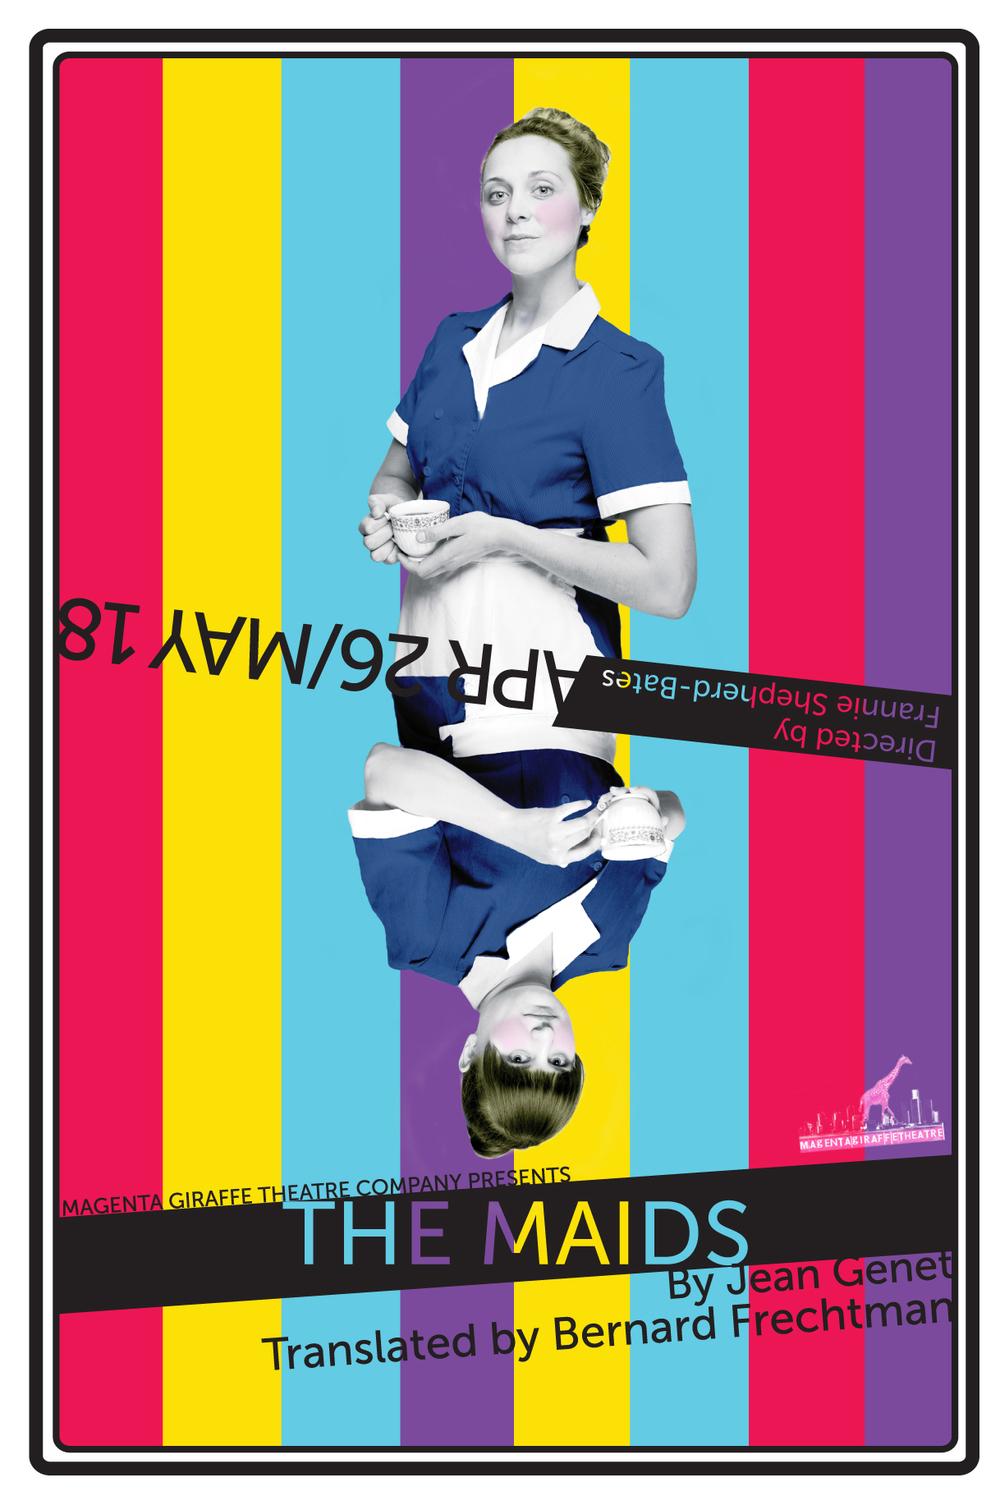 The Maids Program